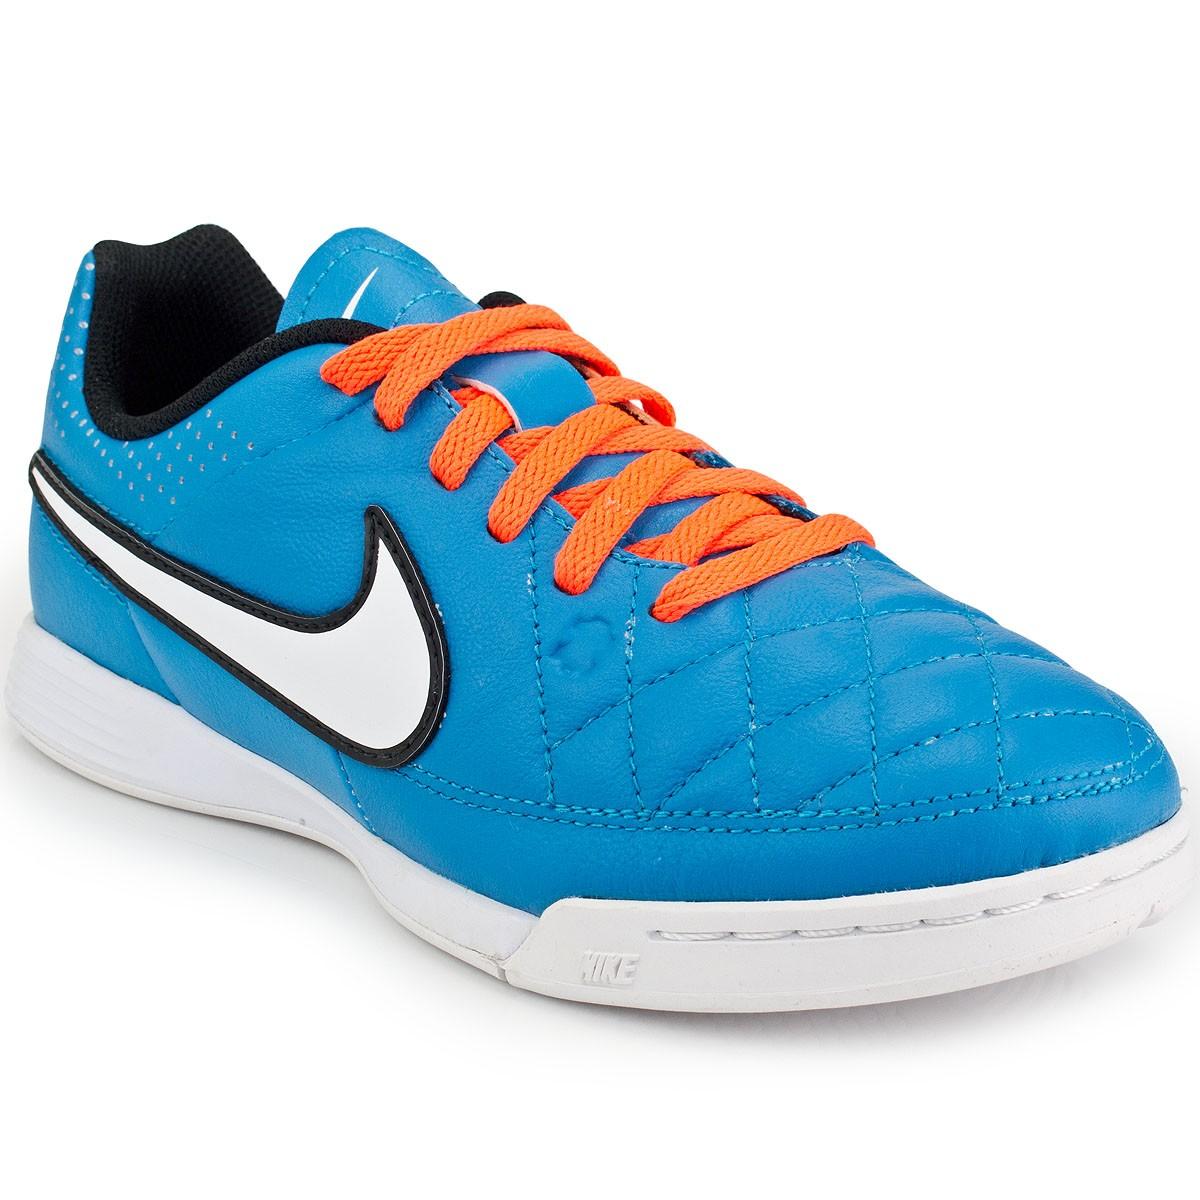 Chuteira Nike Tiempo Genio Leather IC Jr  4d52c8ef5c9b3